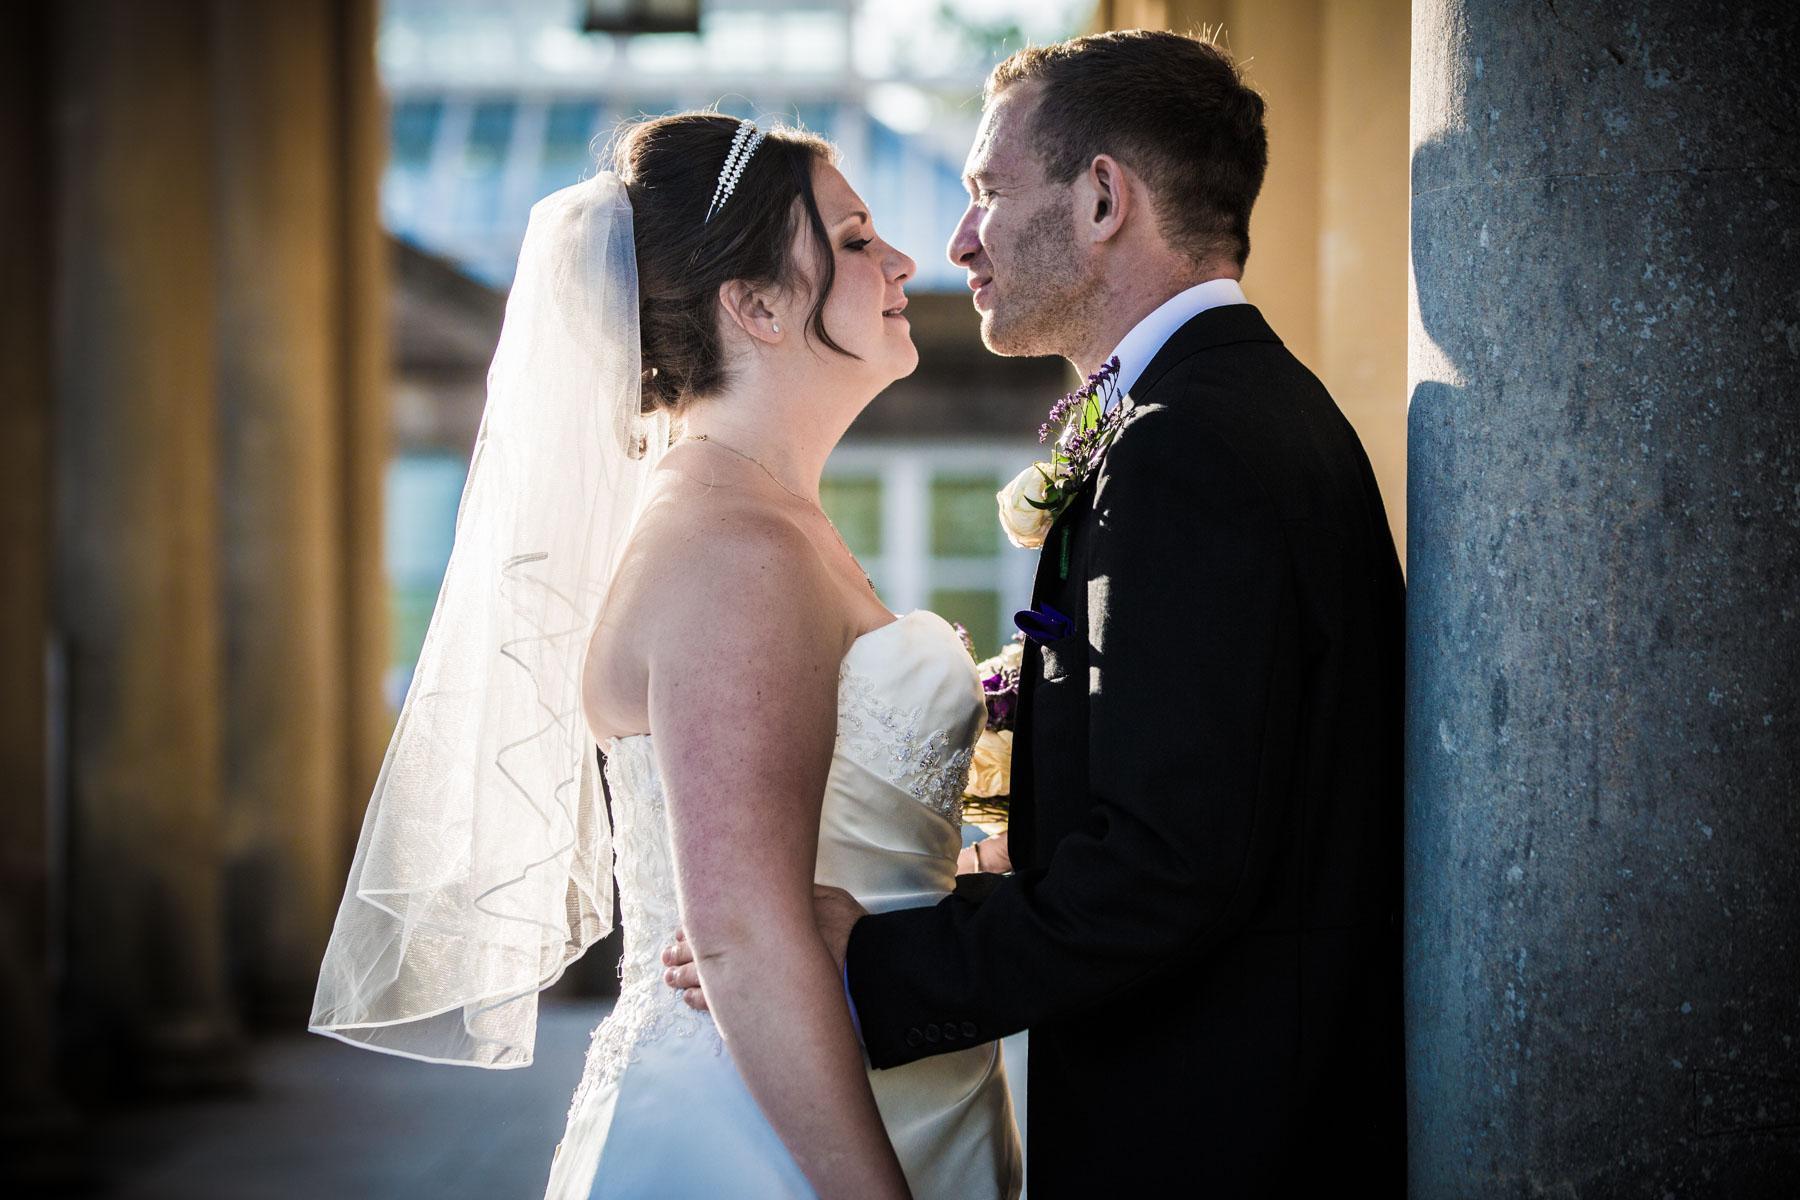 Buxted Park Hotel Sussex wedding photography Richard Murgatroyd